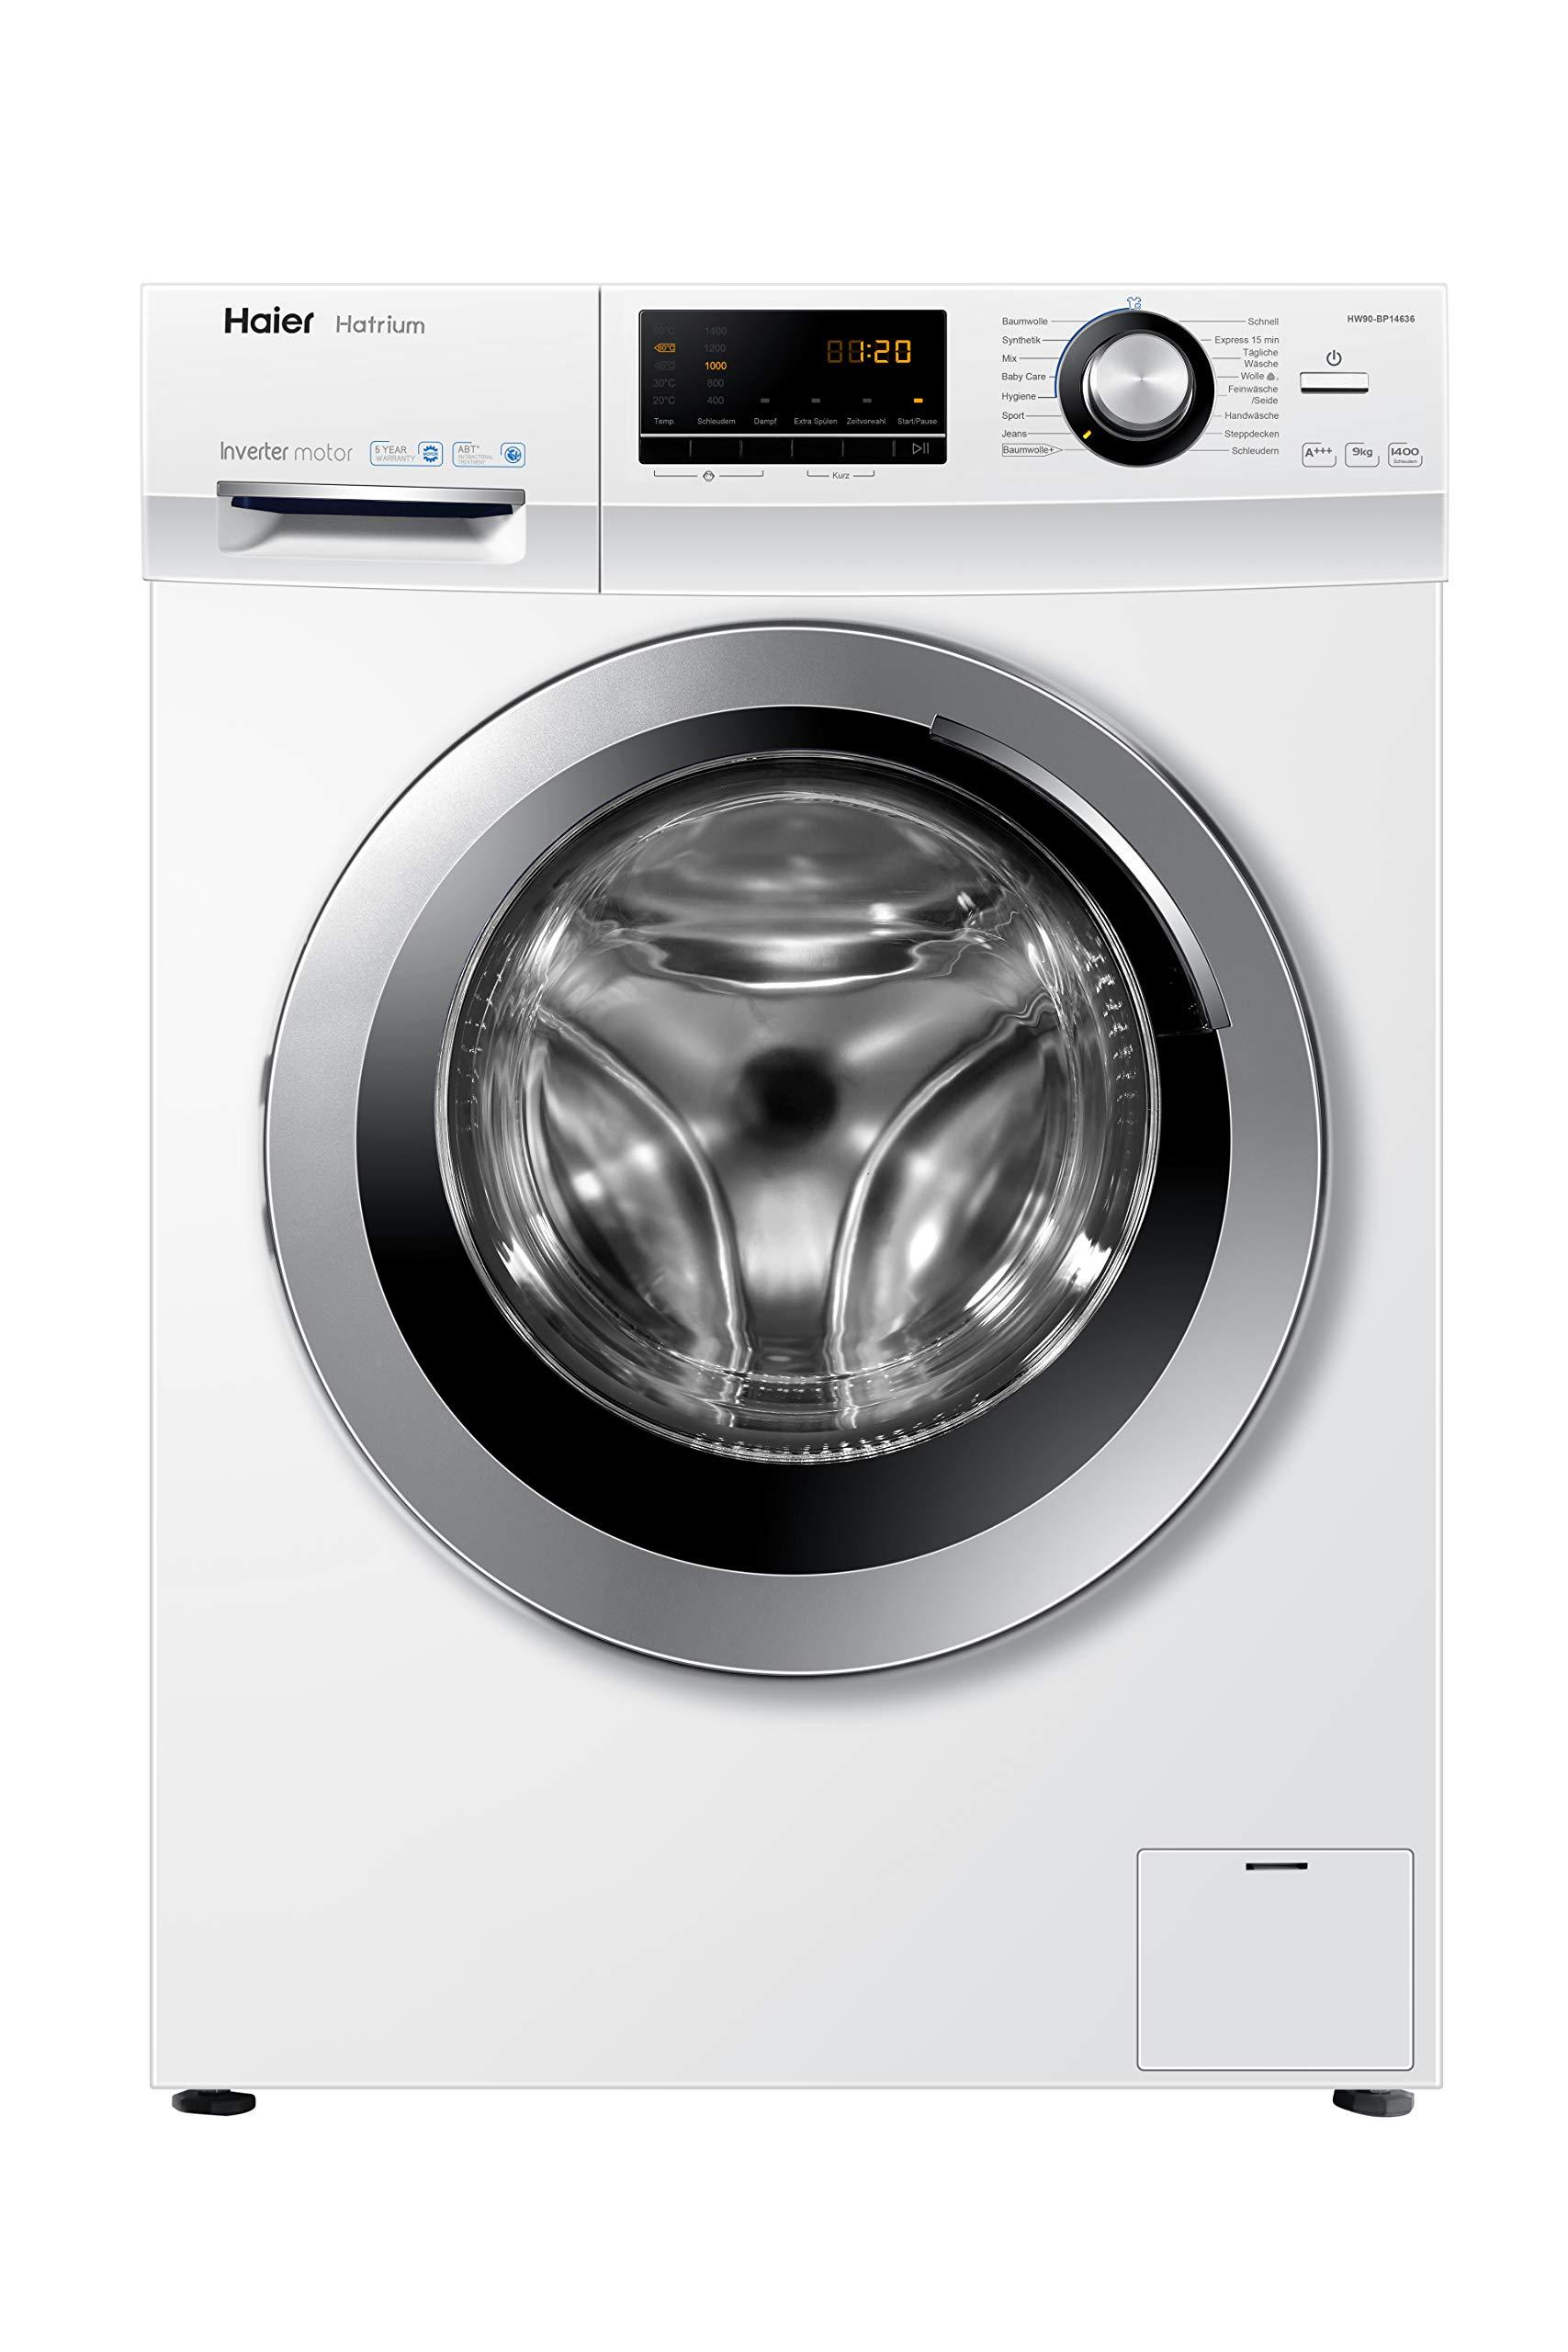 Haier-HW90-BP14636-Waschmaschine-Frontlader-9-kgA-121-kWh-1400-UpMSteam-Dampffunktion-AquaProtect